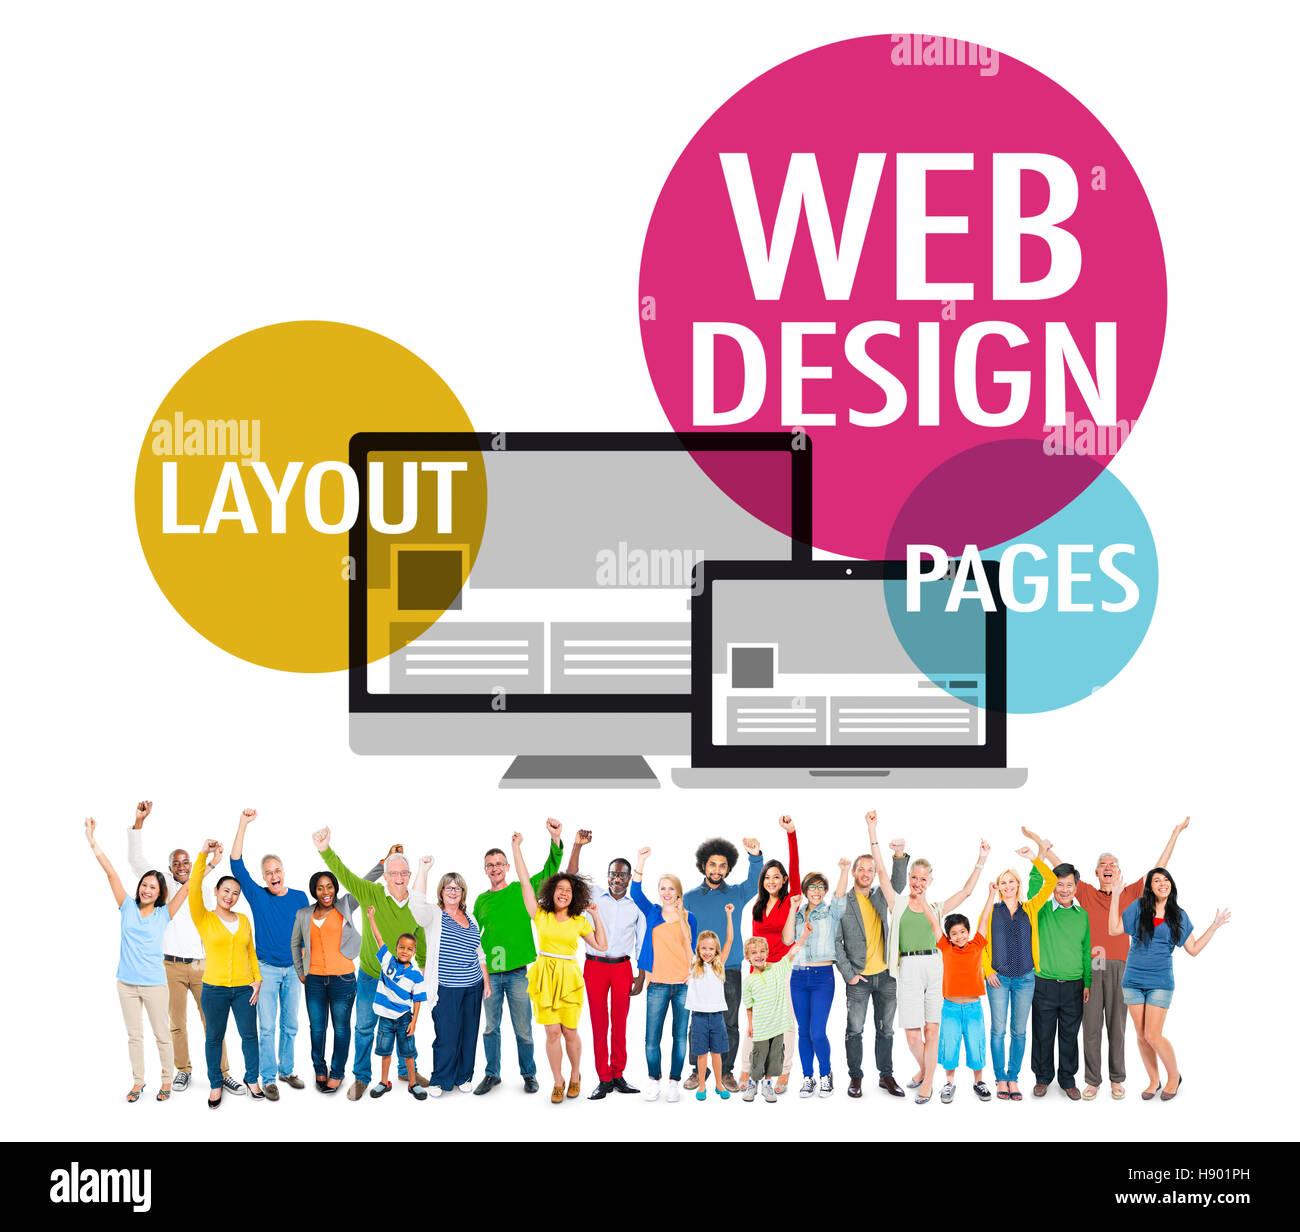 Web Design Content Creative Website Stockfotos & Web Design ...